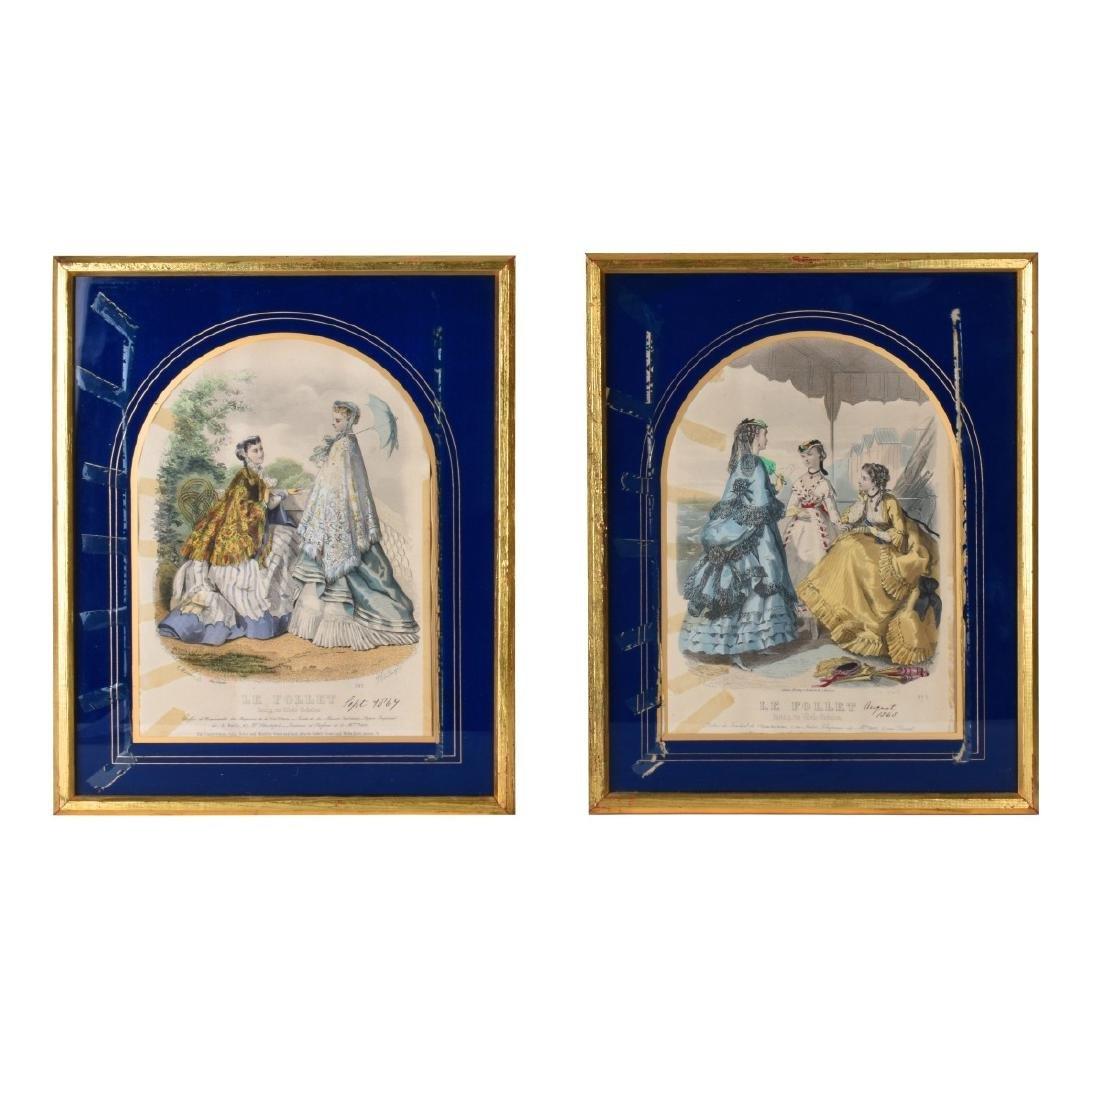 19th Century Le Follet Engravings - 2